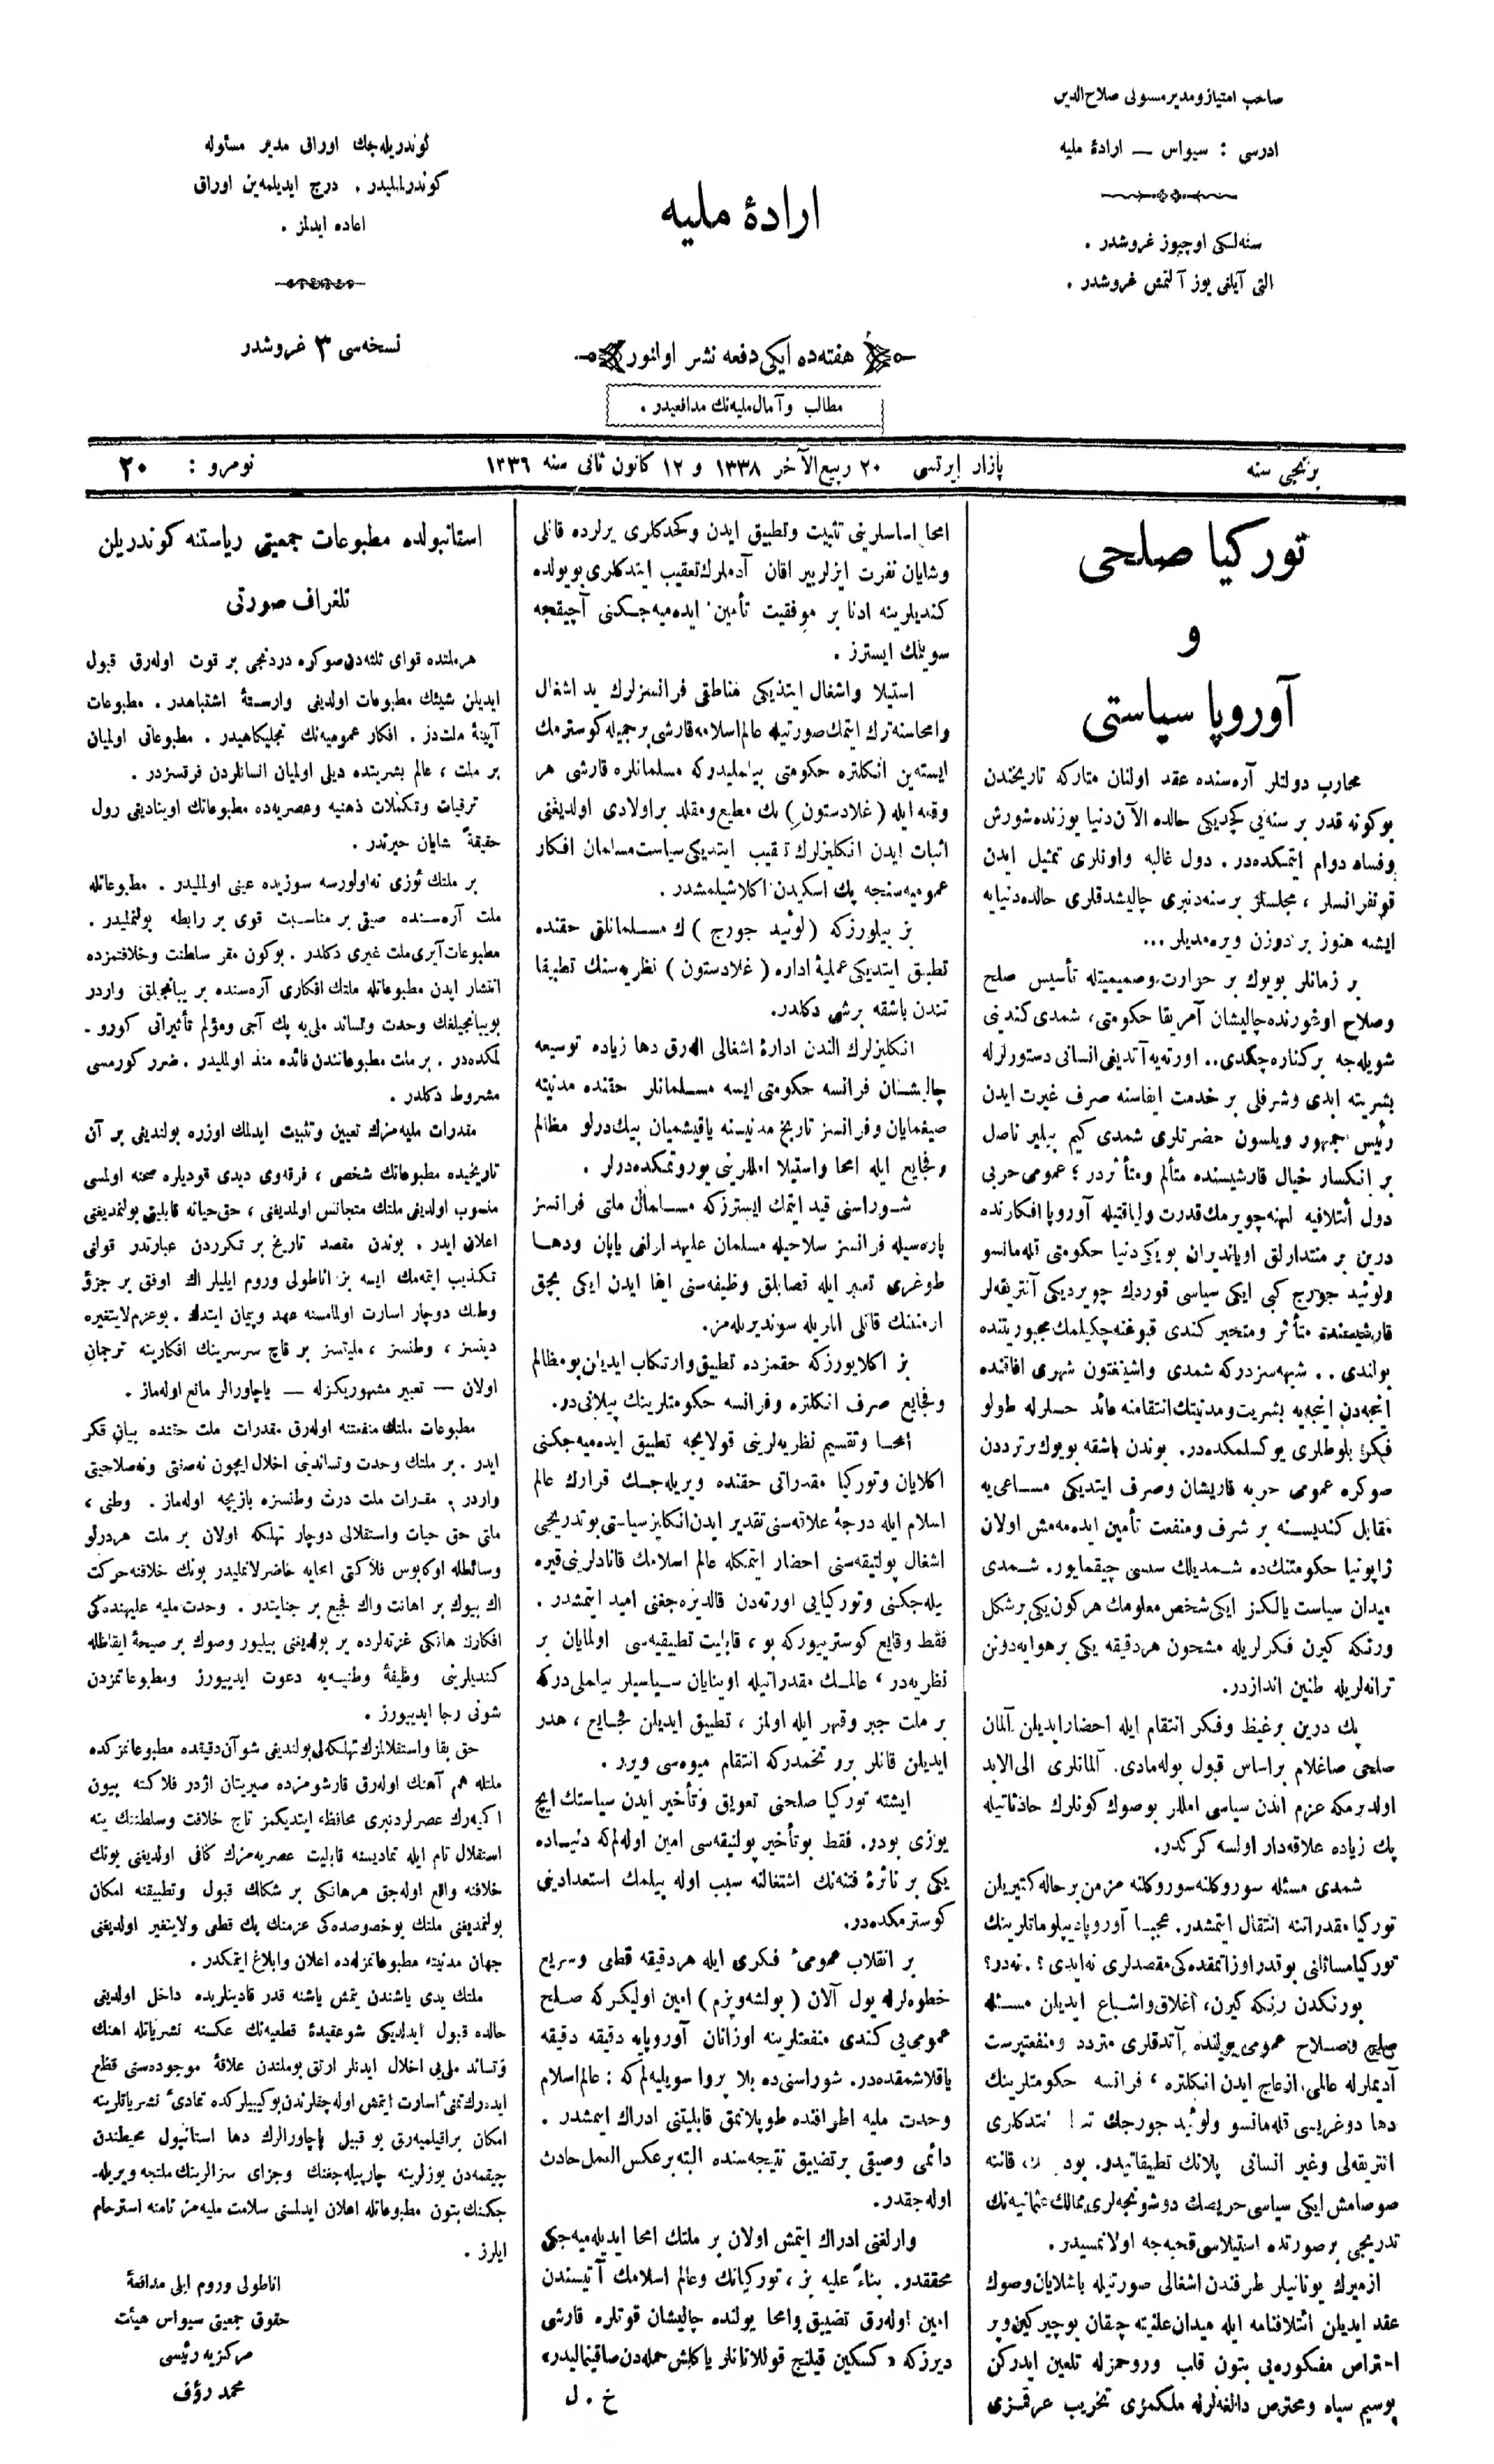 12 Ocak 1920 Tarihli İrade-i Milliye (Sivas) Gazetesi Sayfa 1